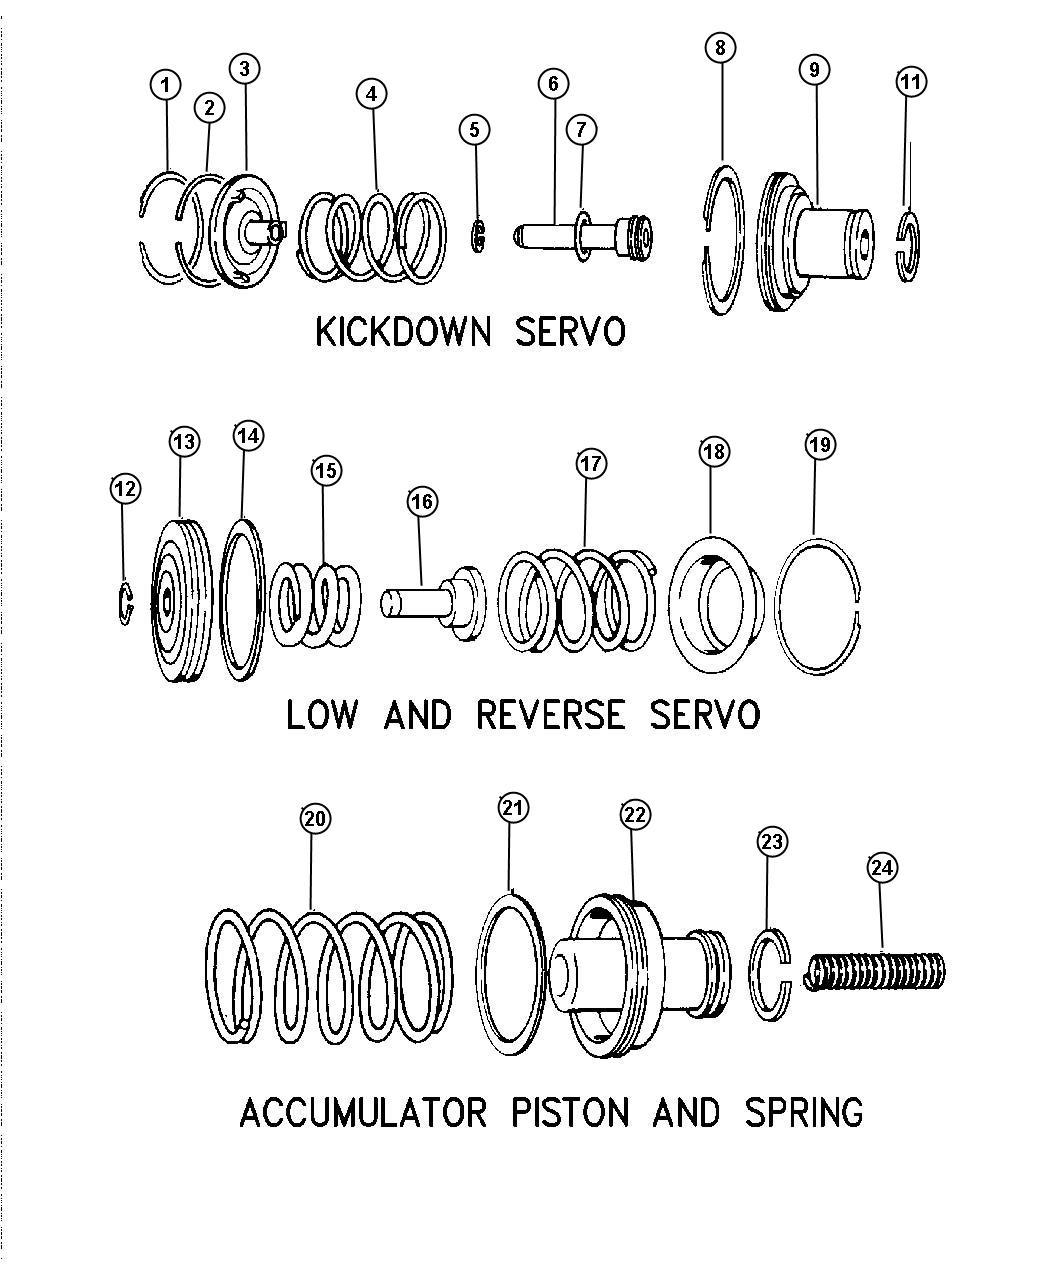 Dodge Durango Spring. Transmission accumulator. Lower